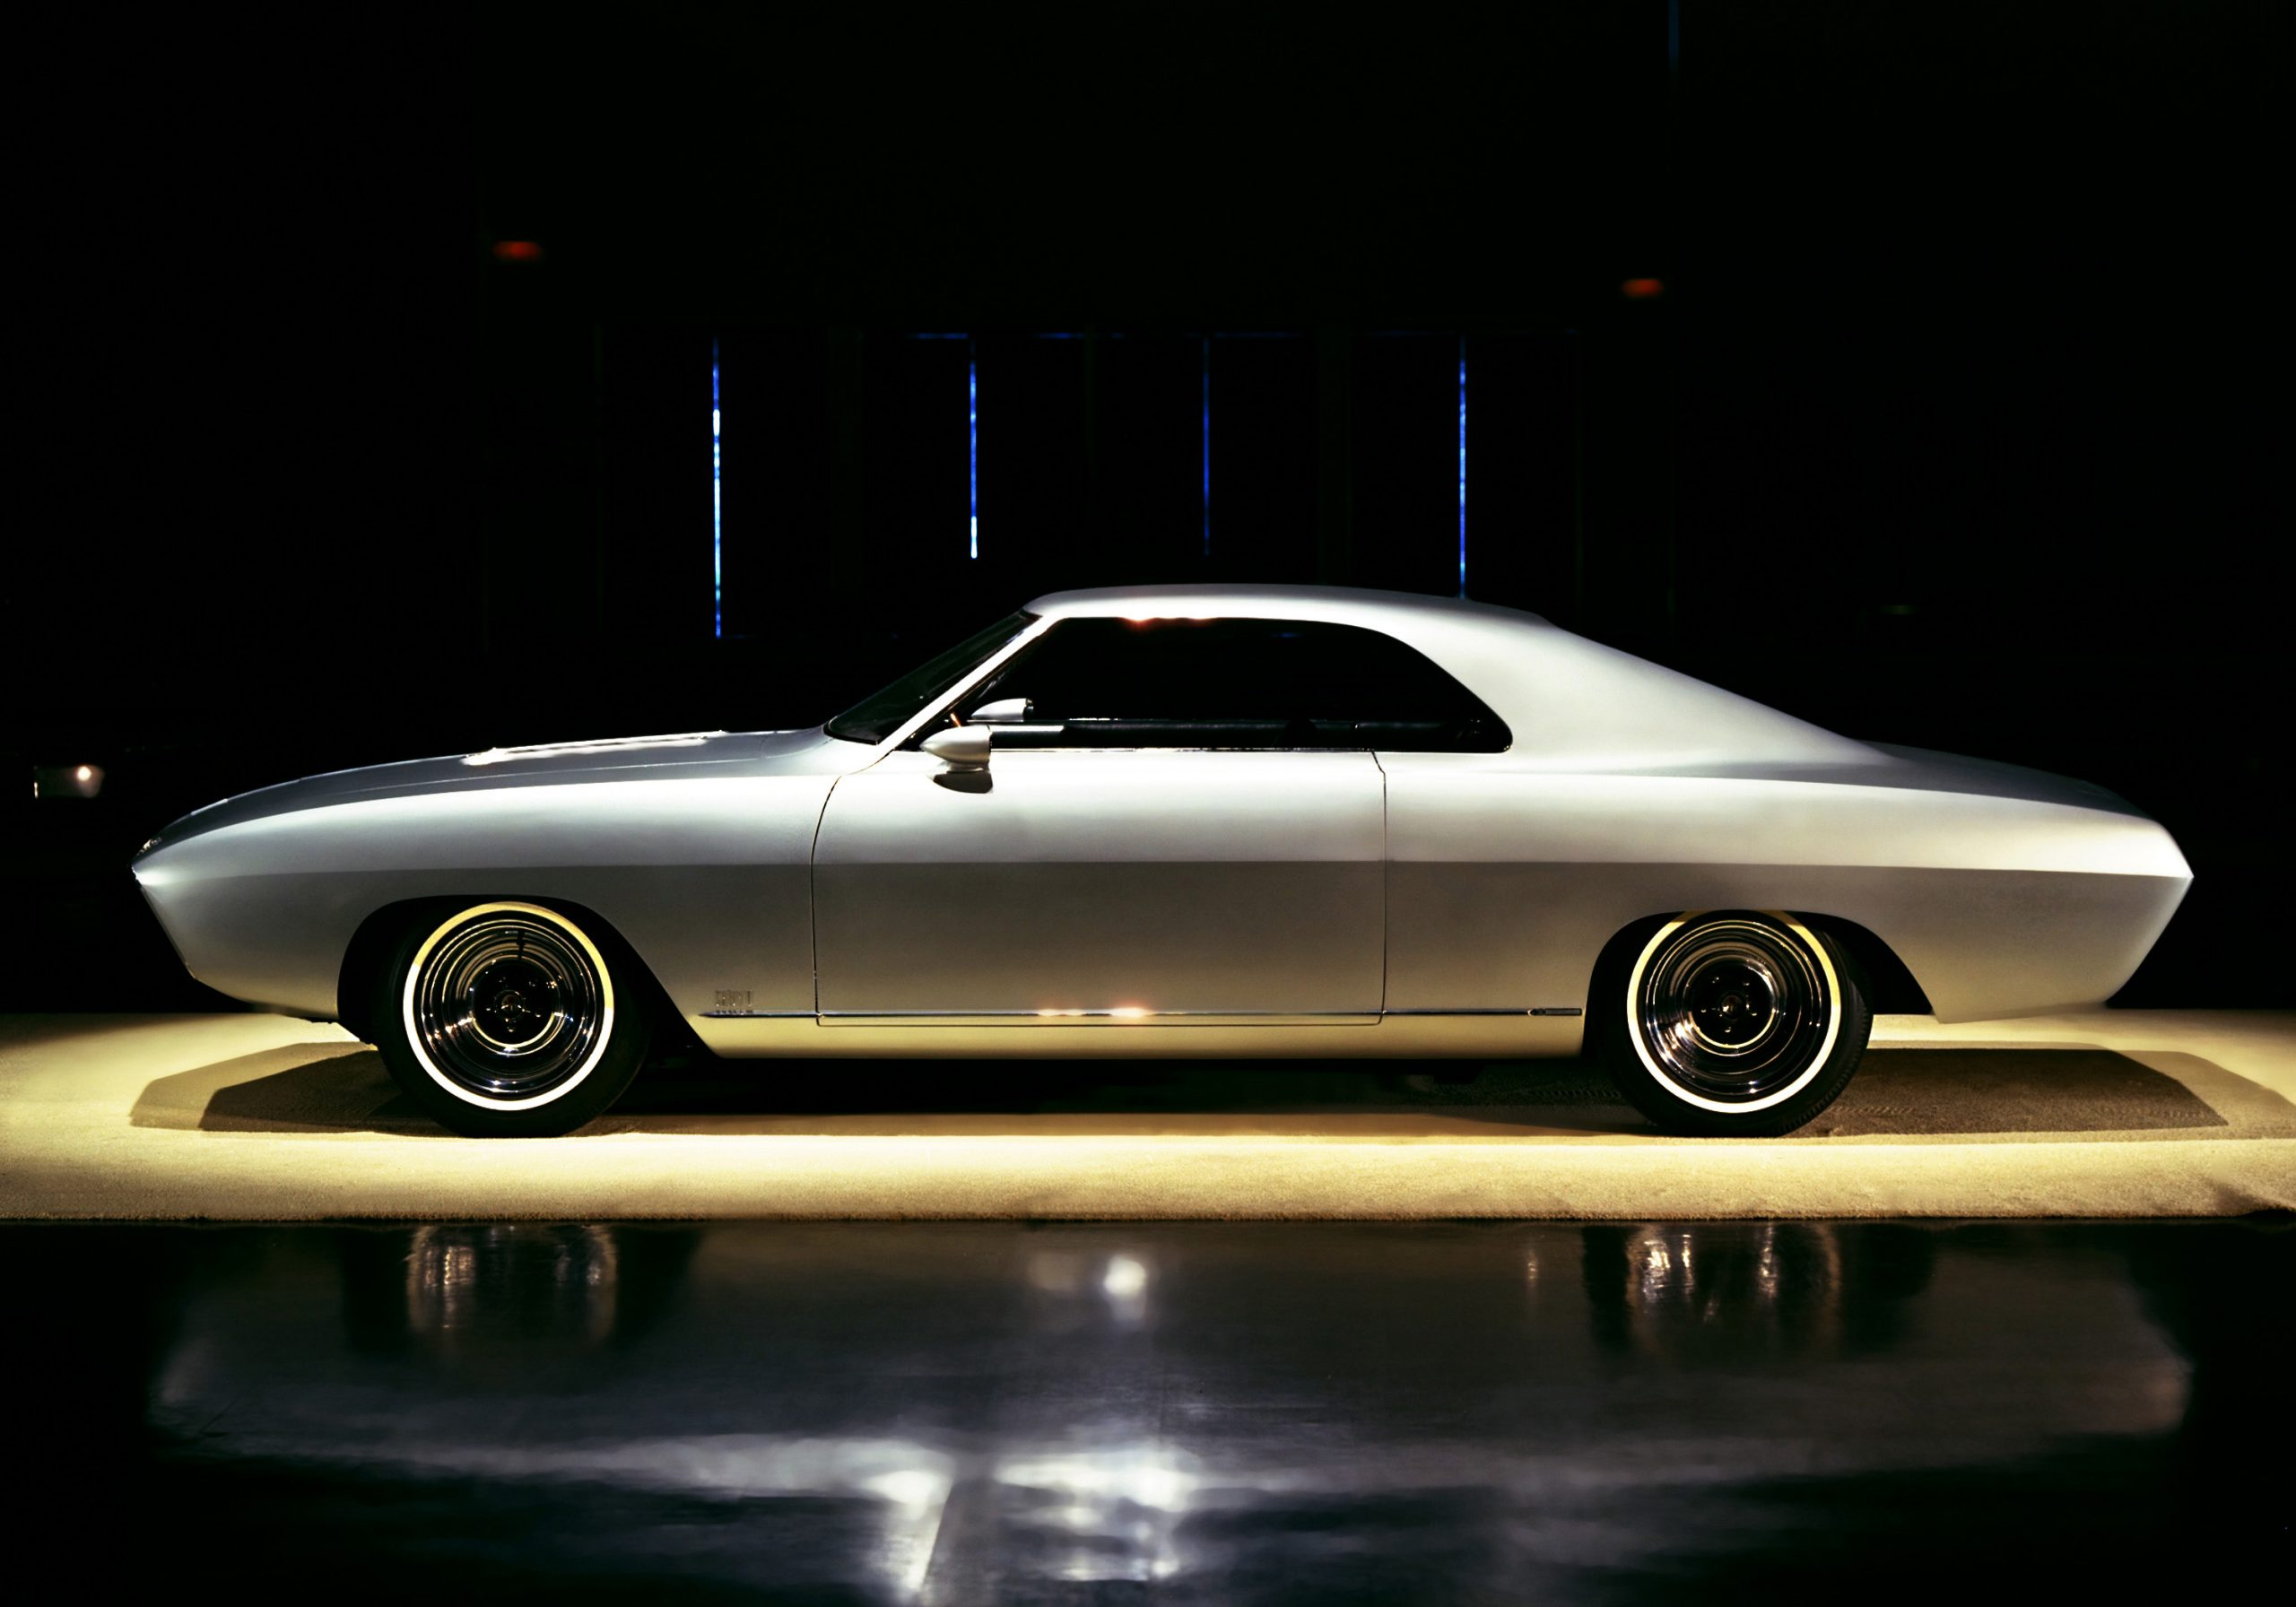 1964 Chevrolet Super Nova concept 6 side